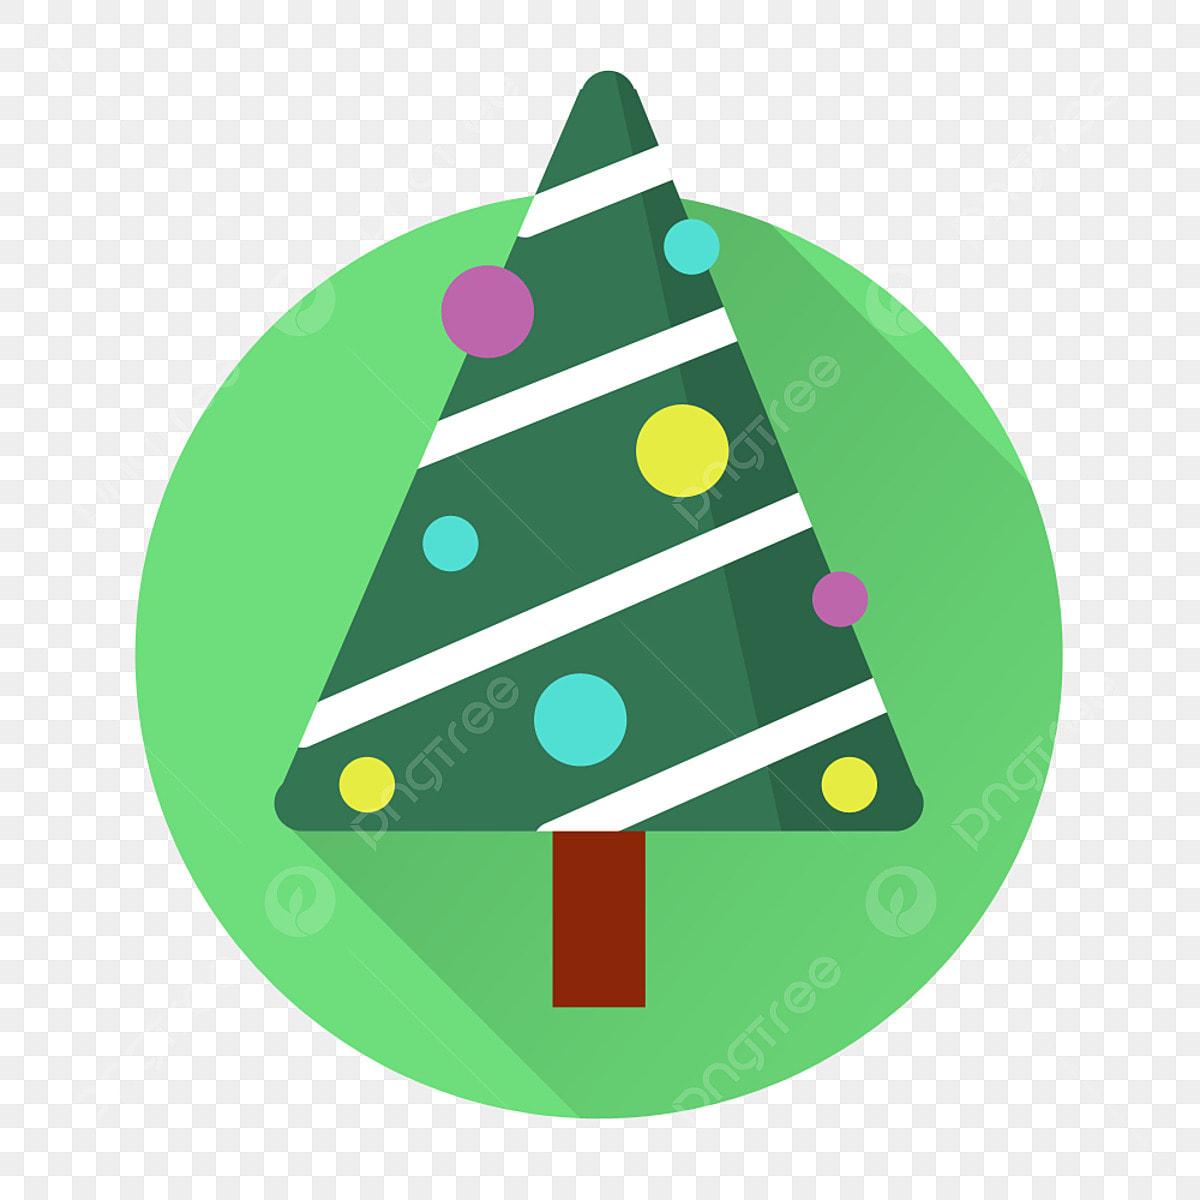 Decoration De Paquets Cadeaux arbre de noel décoration de sapin de noel cadeau paquet